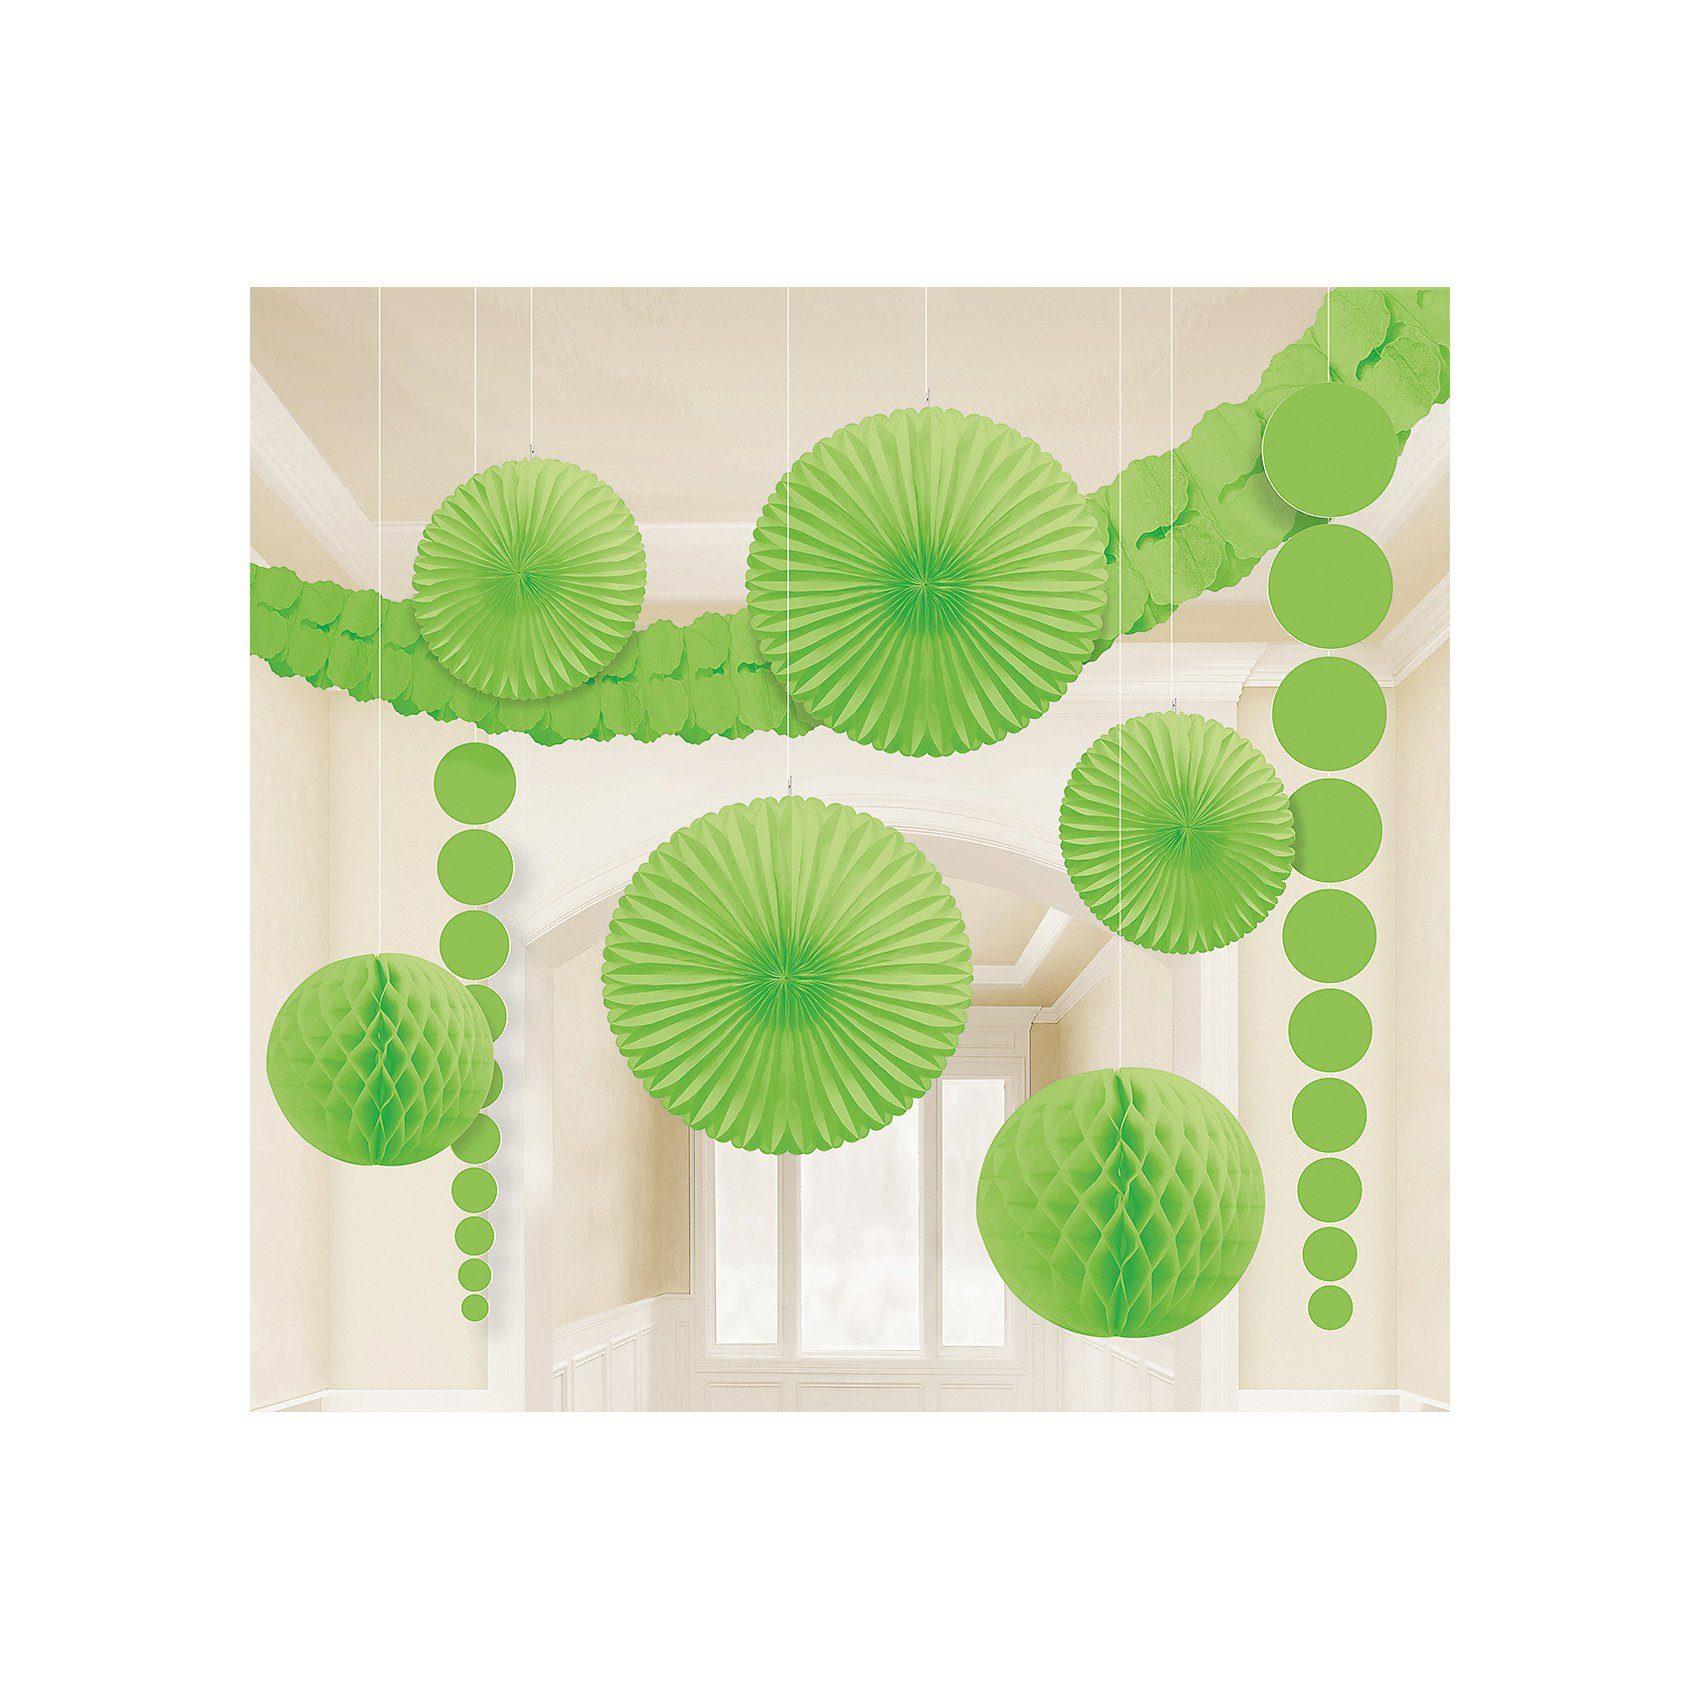 Amscan Deko-Set grün, 9-tlg.